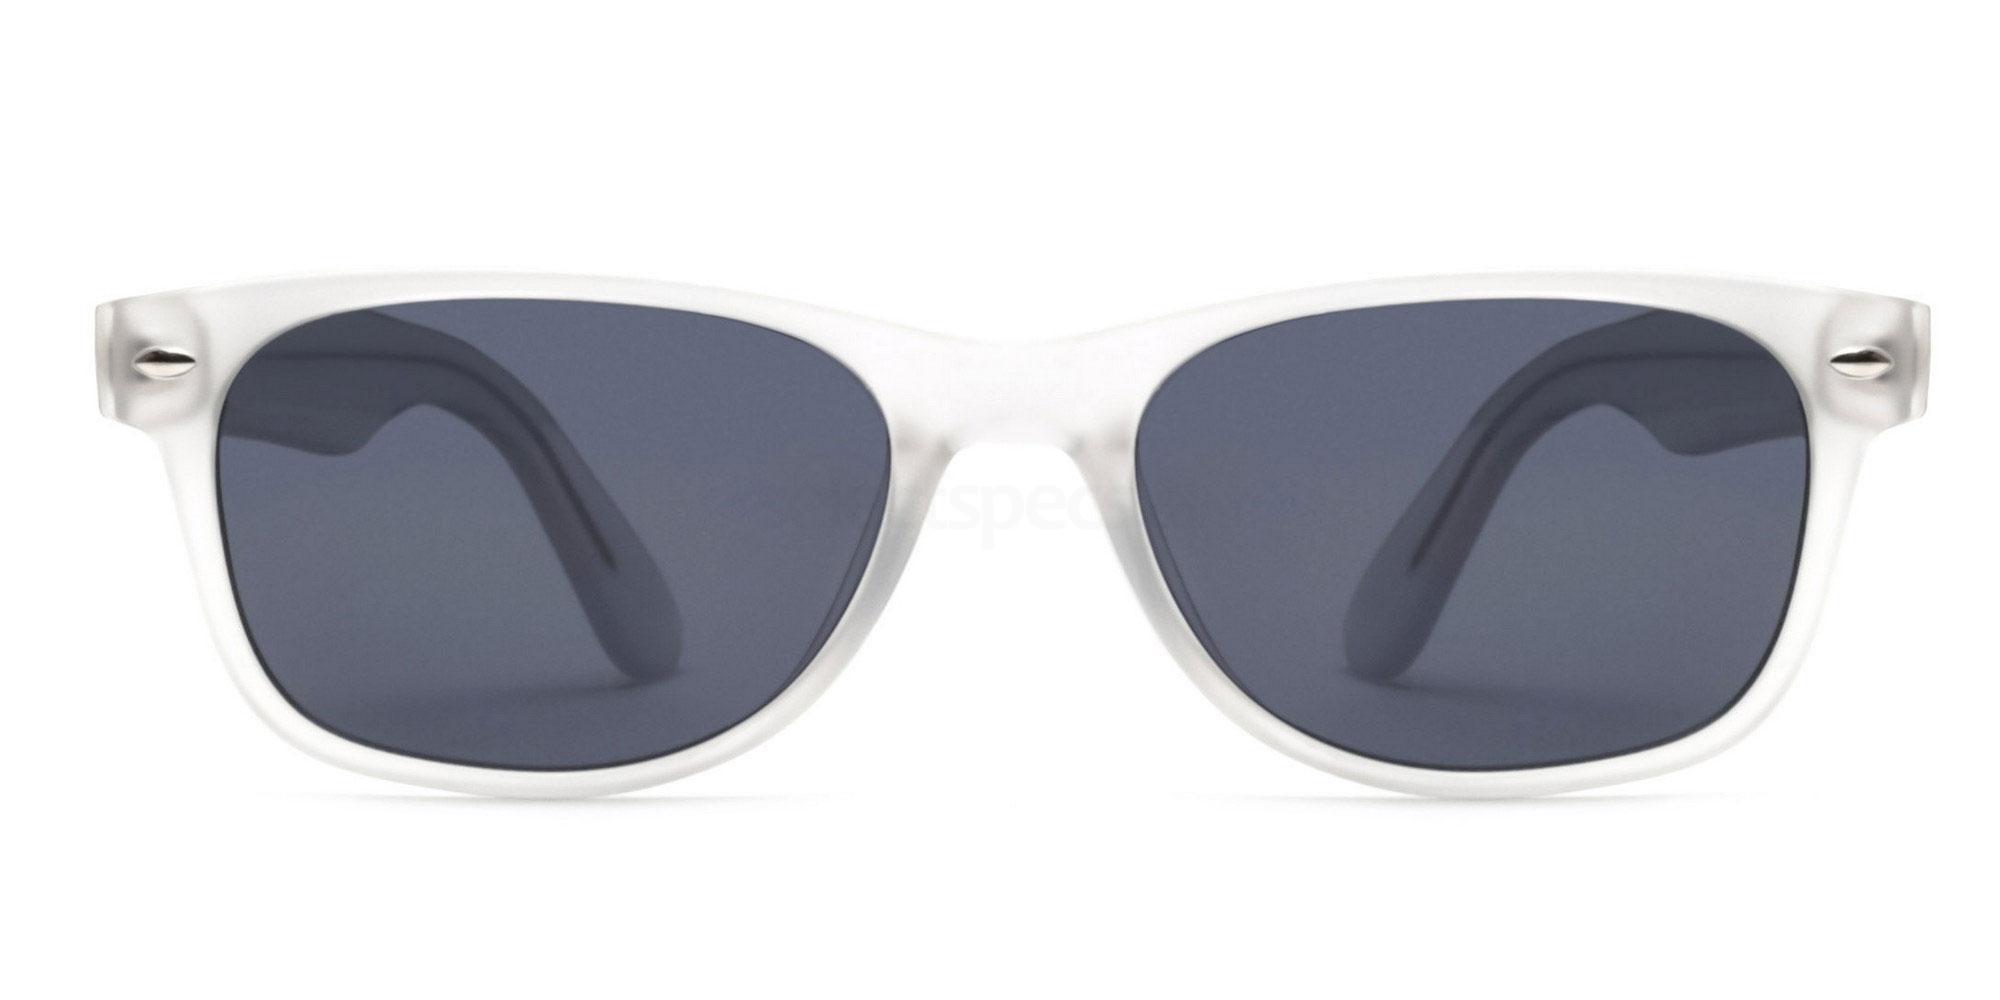 Clear S8122 - Clear (Sunglasses) Sunglasses, Savannah